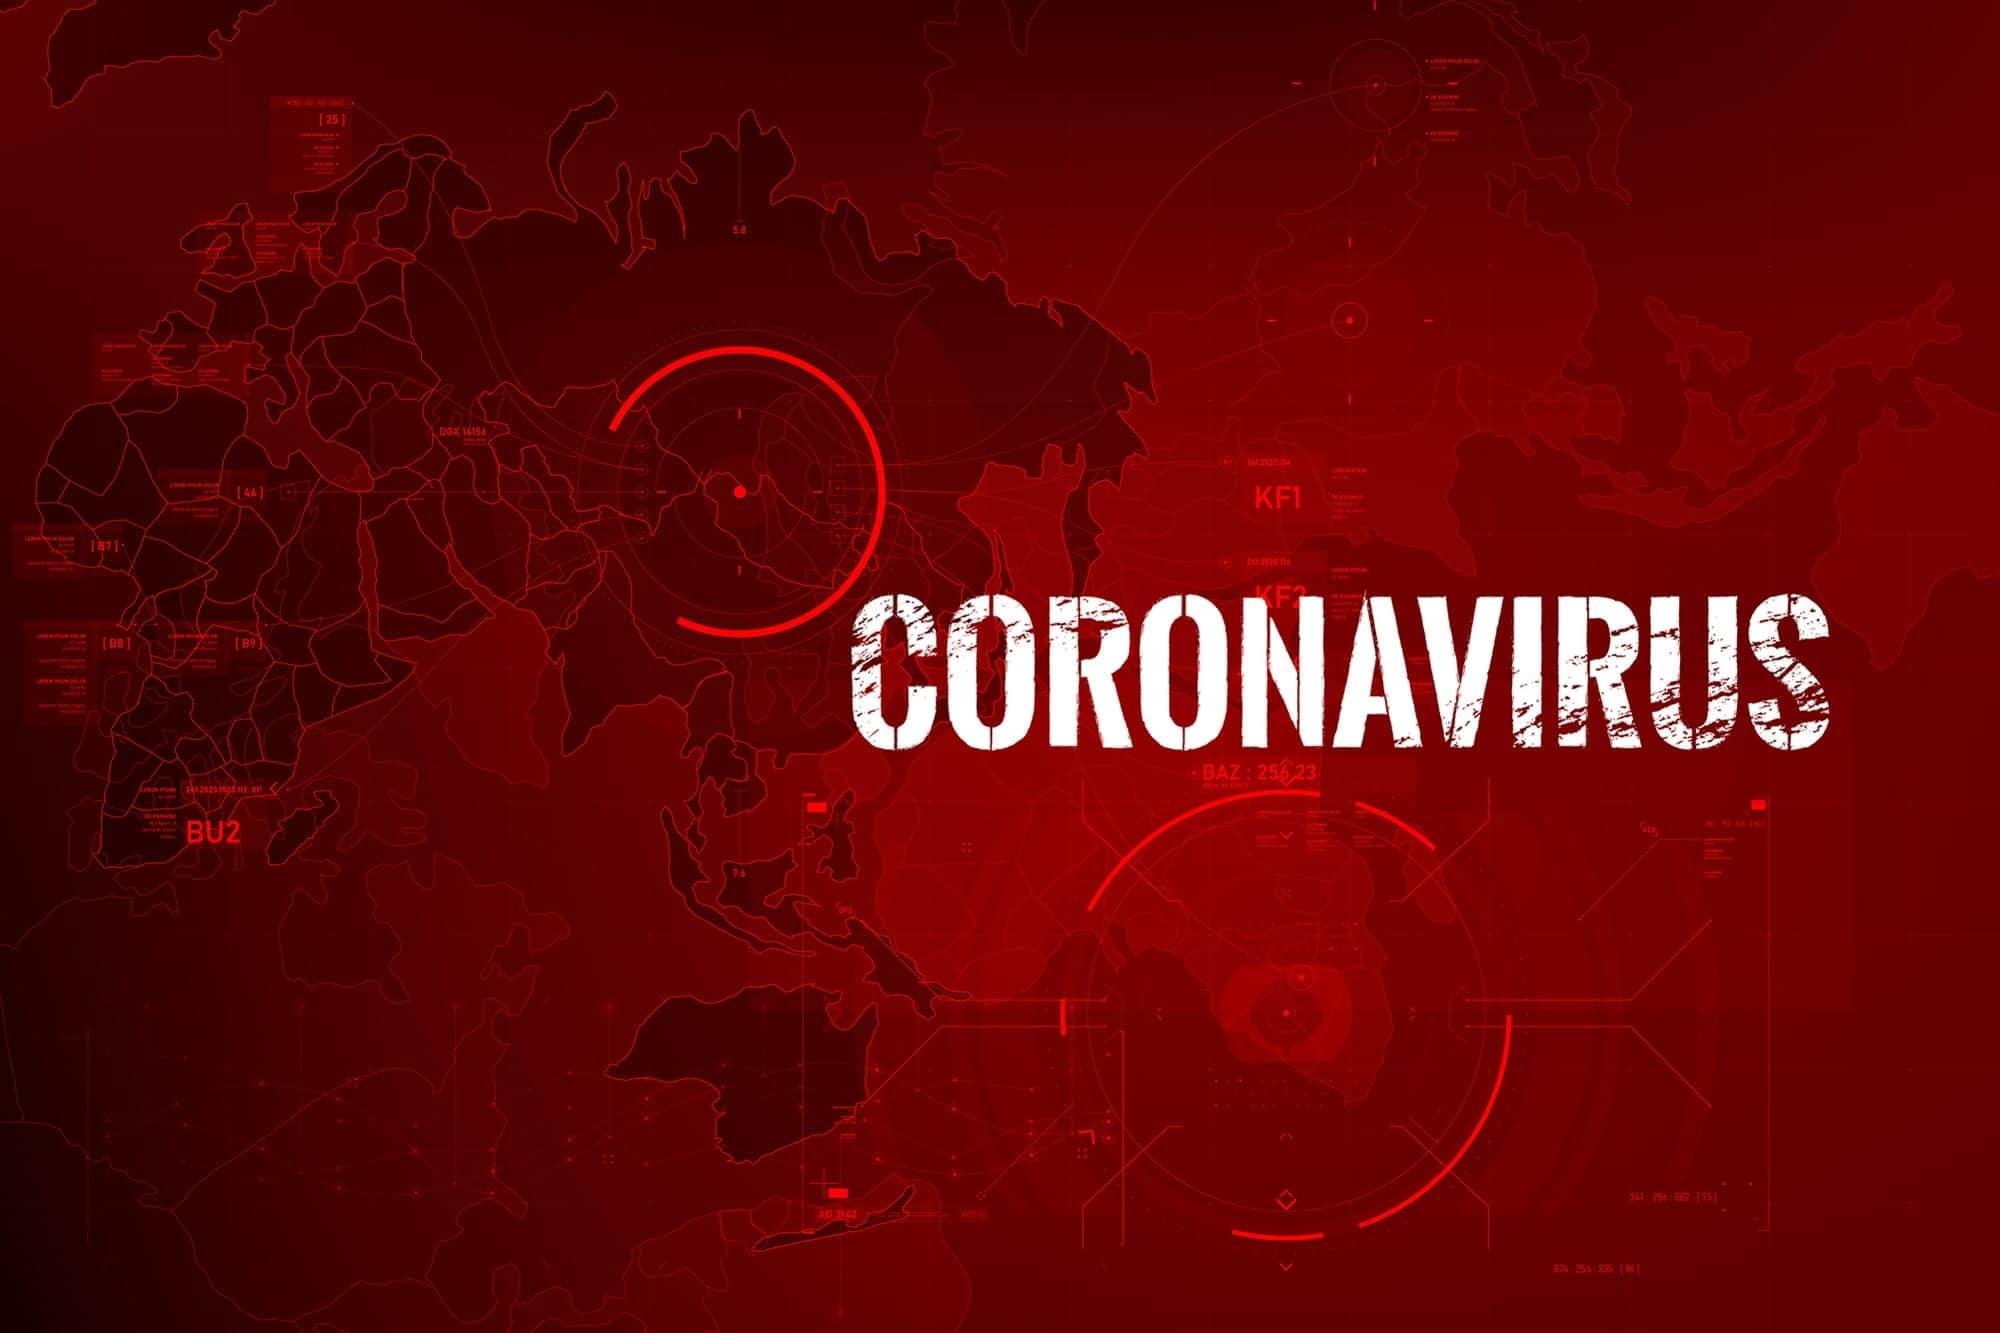 Scientists Trace Original Covid-19 Case to November 17